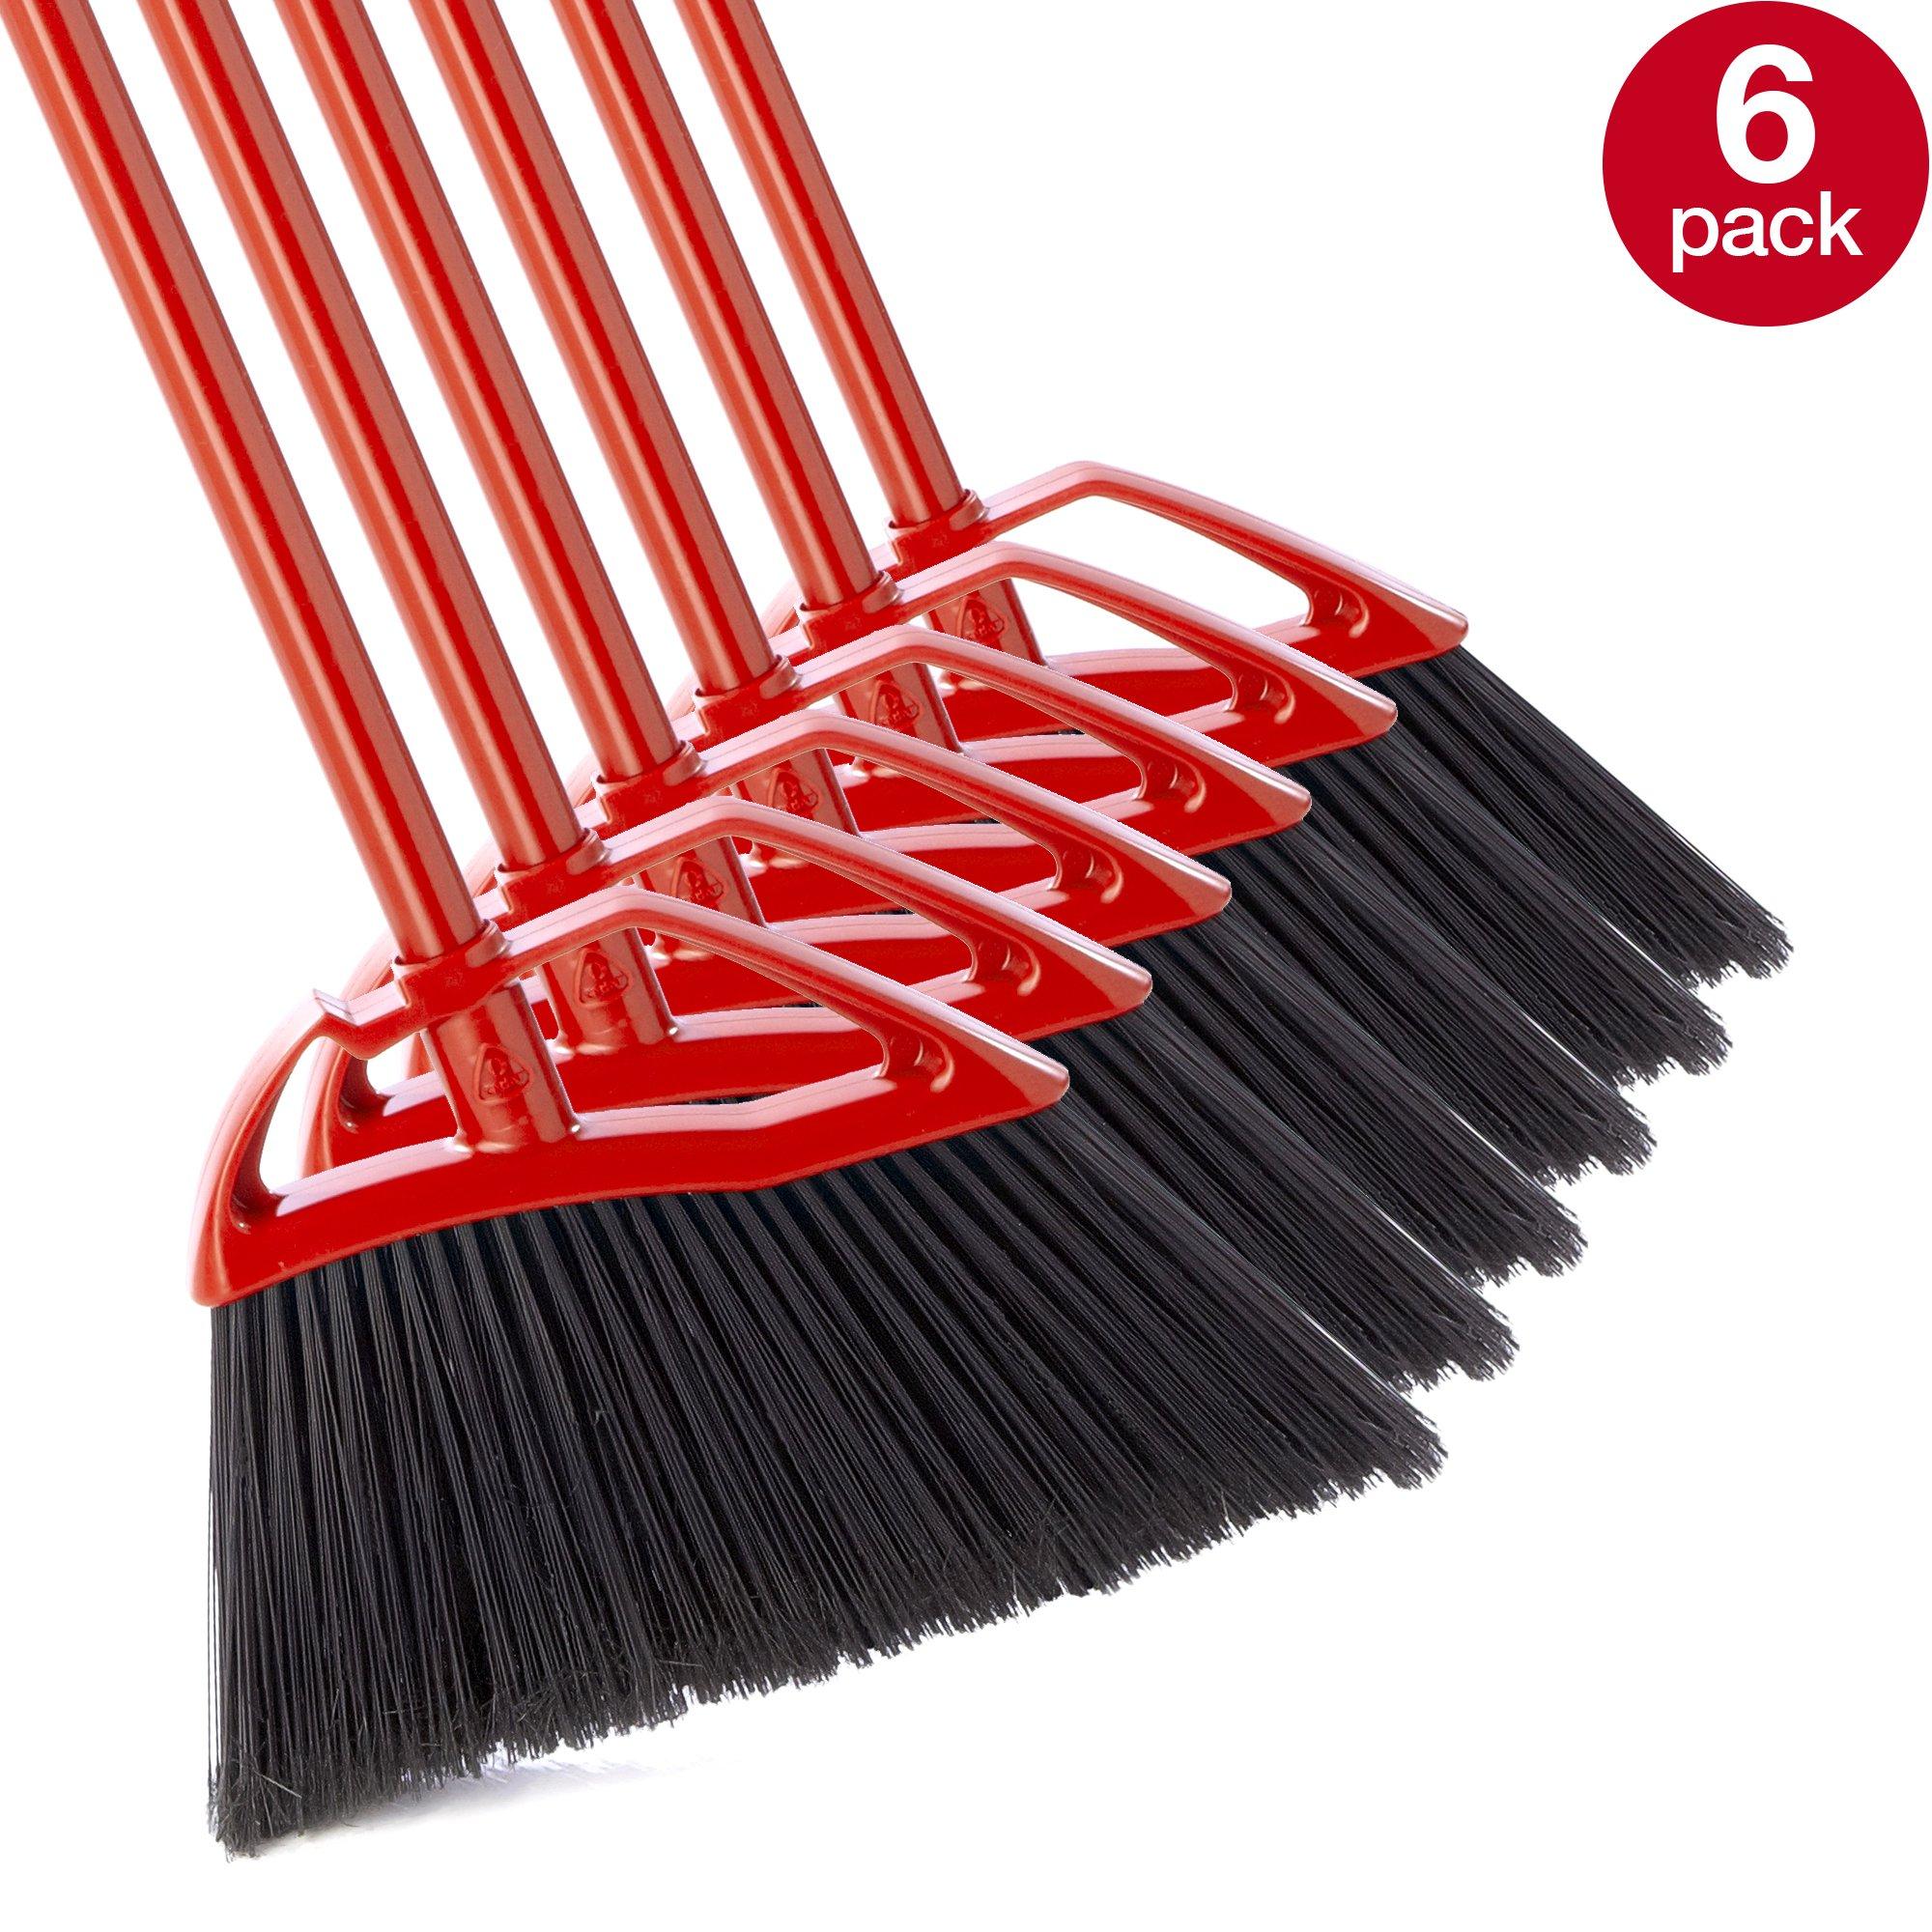 O-Cedar Fast and Easy Angle Broom (Pack - 6)